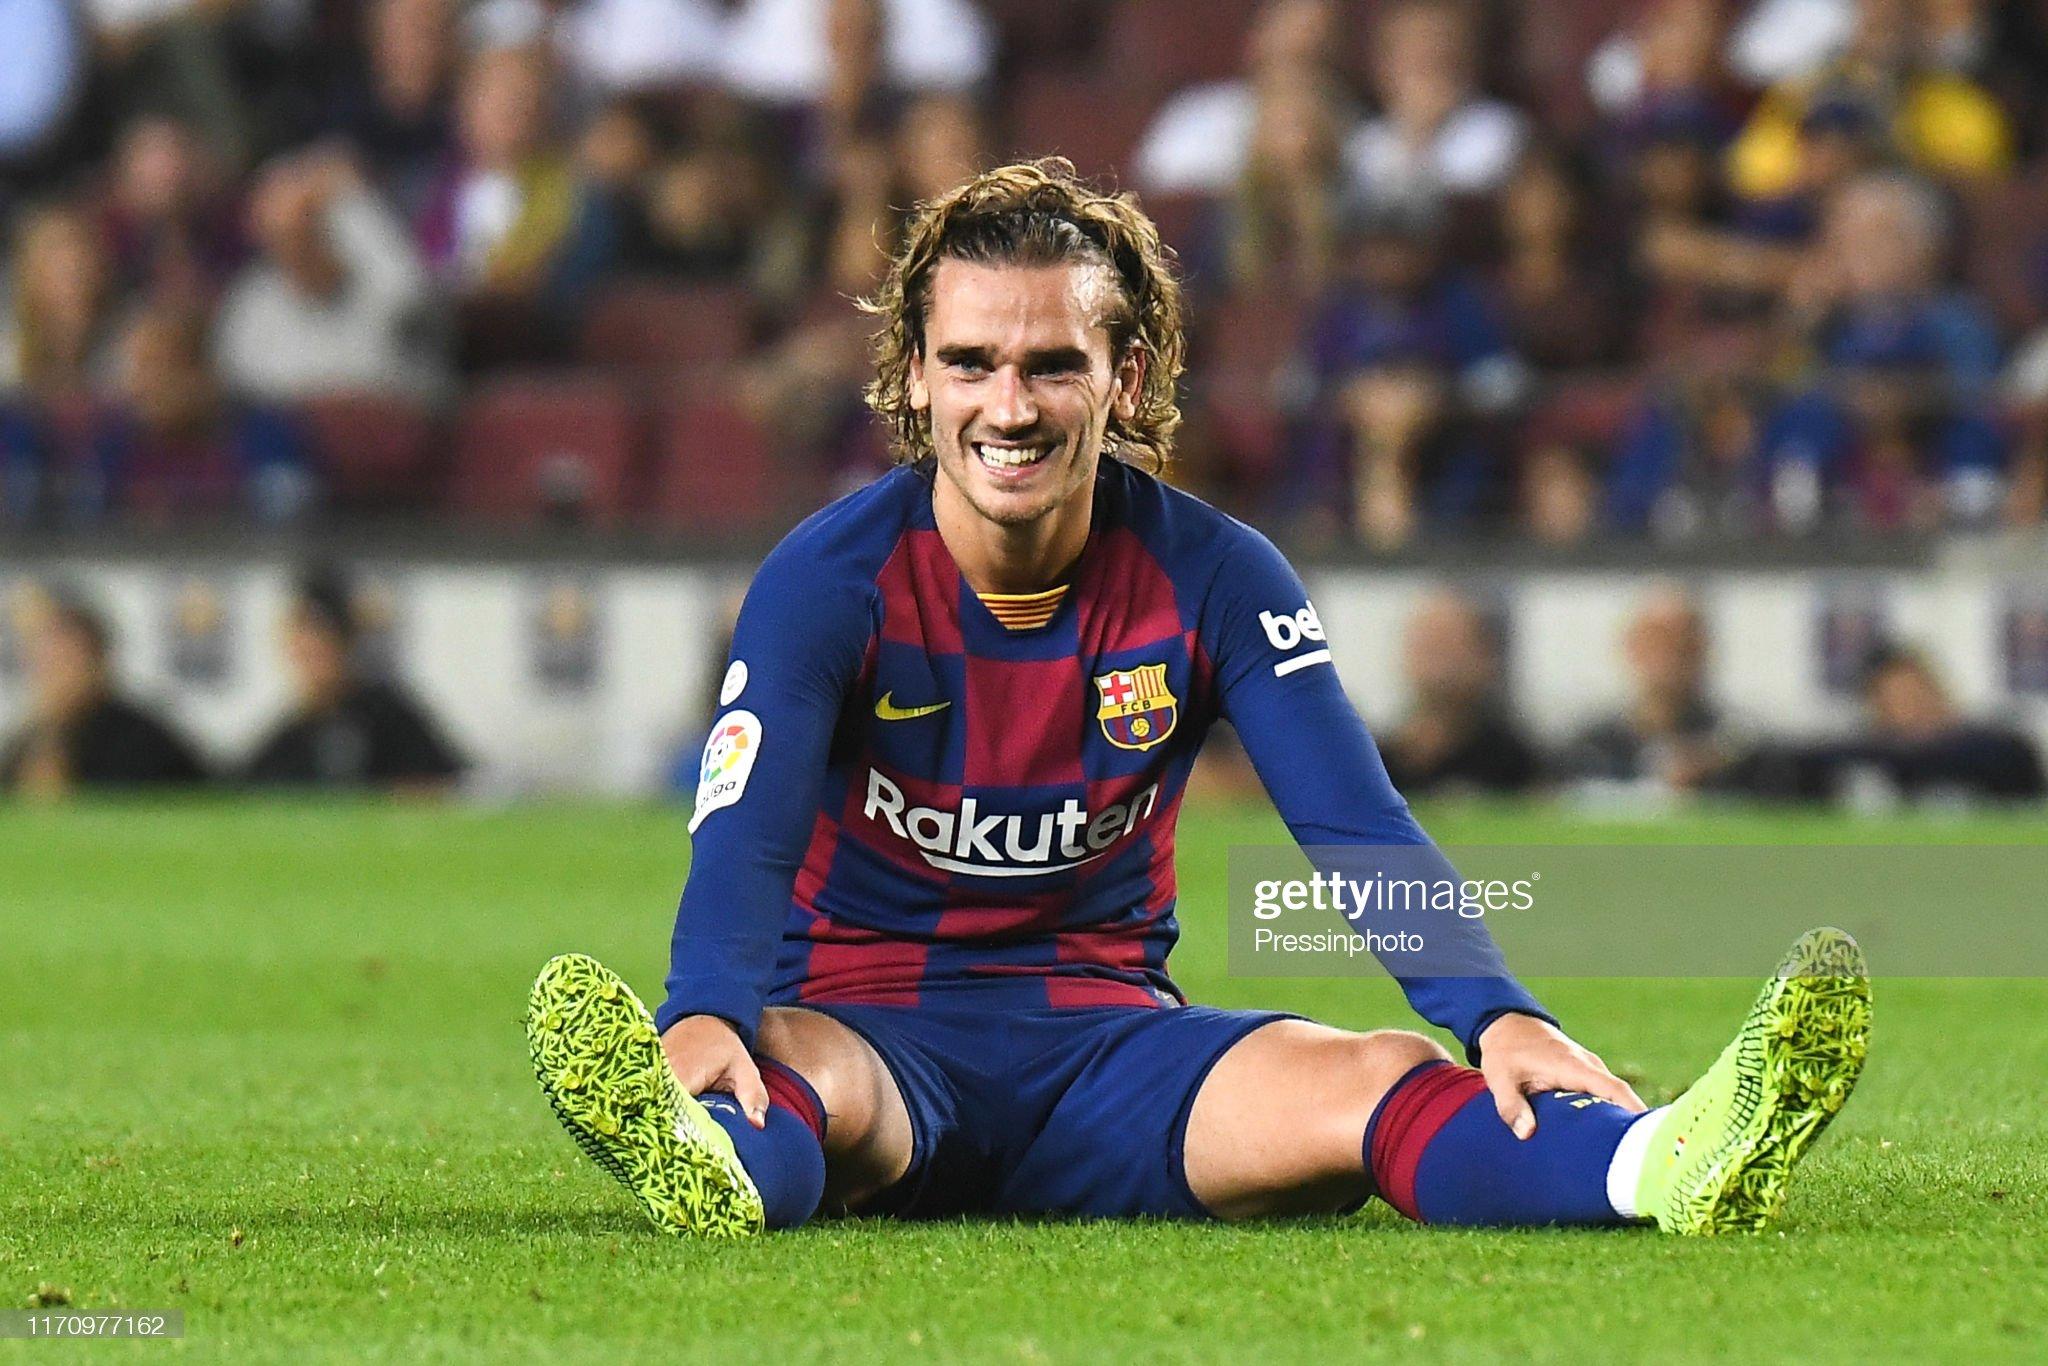 صور مباراة : برشلونة - فياريال 2-1 ( 24-09-2019 )  Antoine-griezmann-of-fc-barcelona-during-the-liga-match-between-and-picture-id1170977162?s=2048x2048